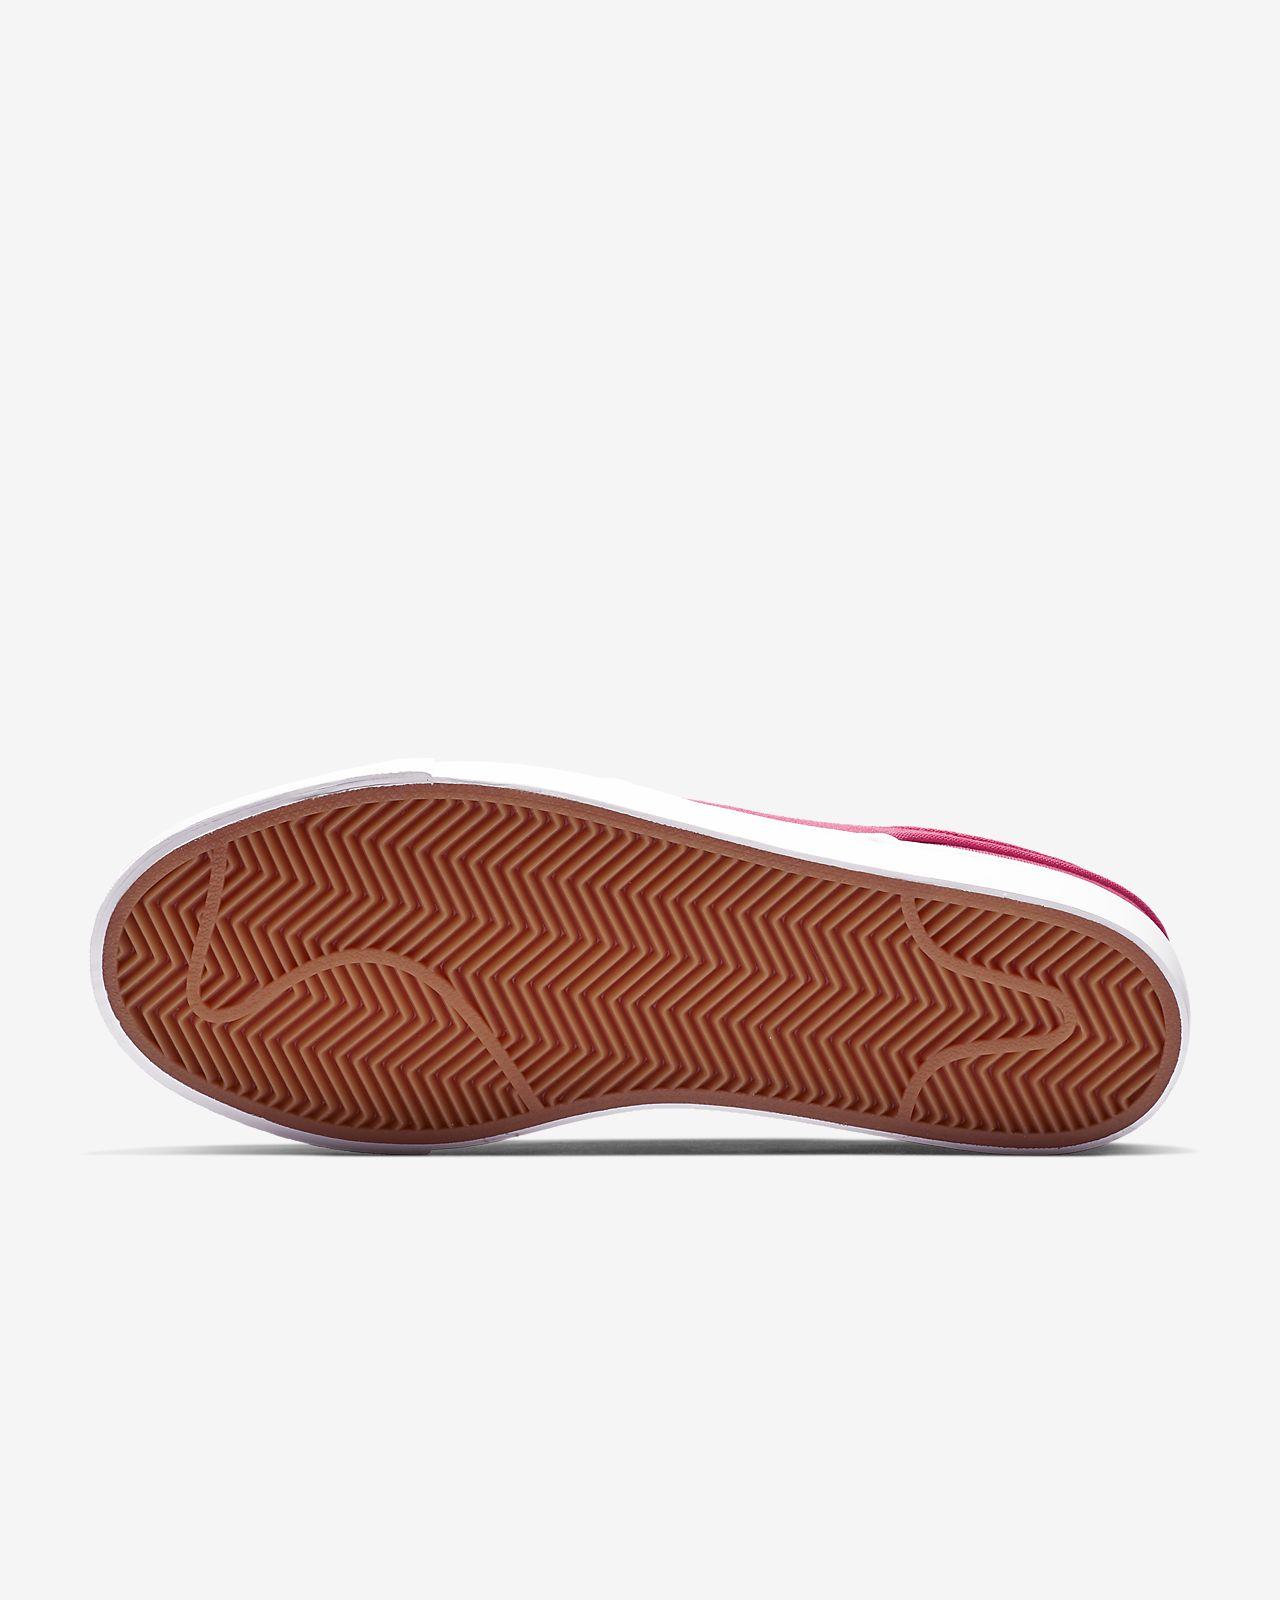 info for a047e a1034 ... Nike SB Zoom Stefan Janoski Canvas-skatersko til mænd